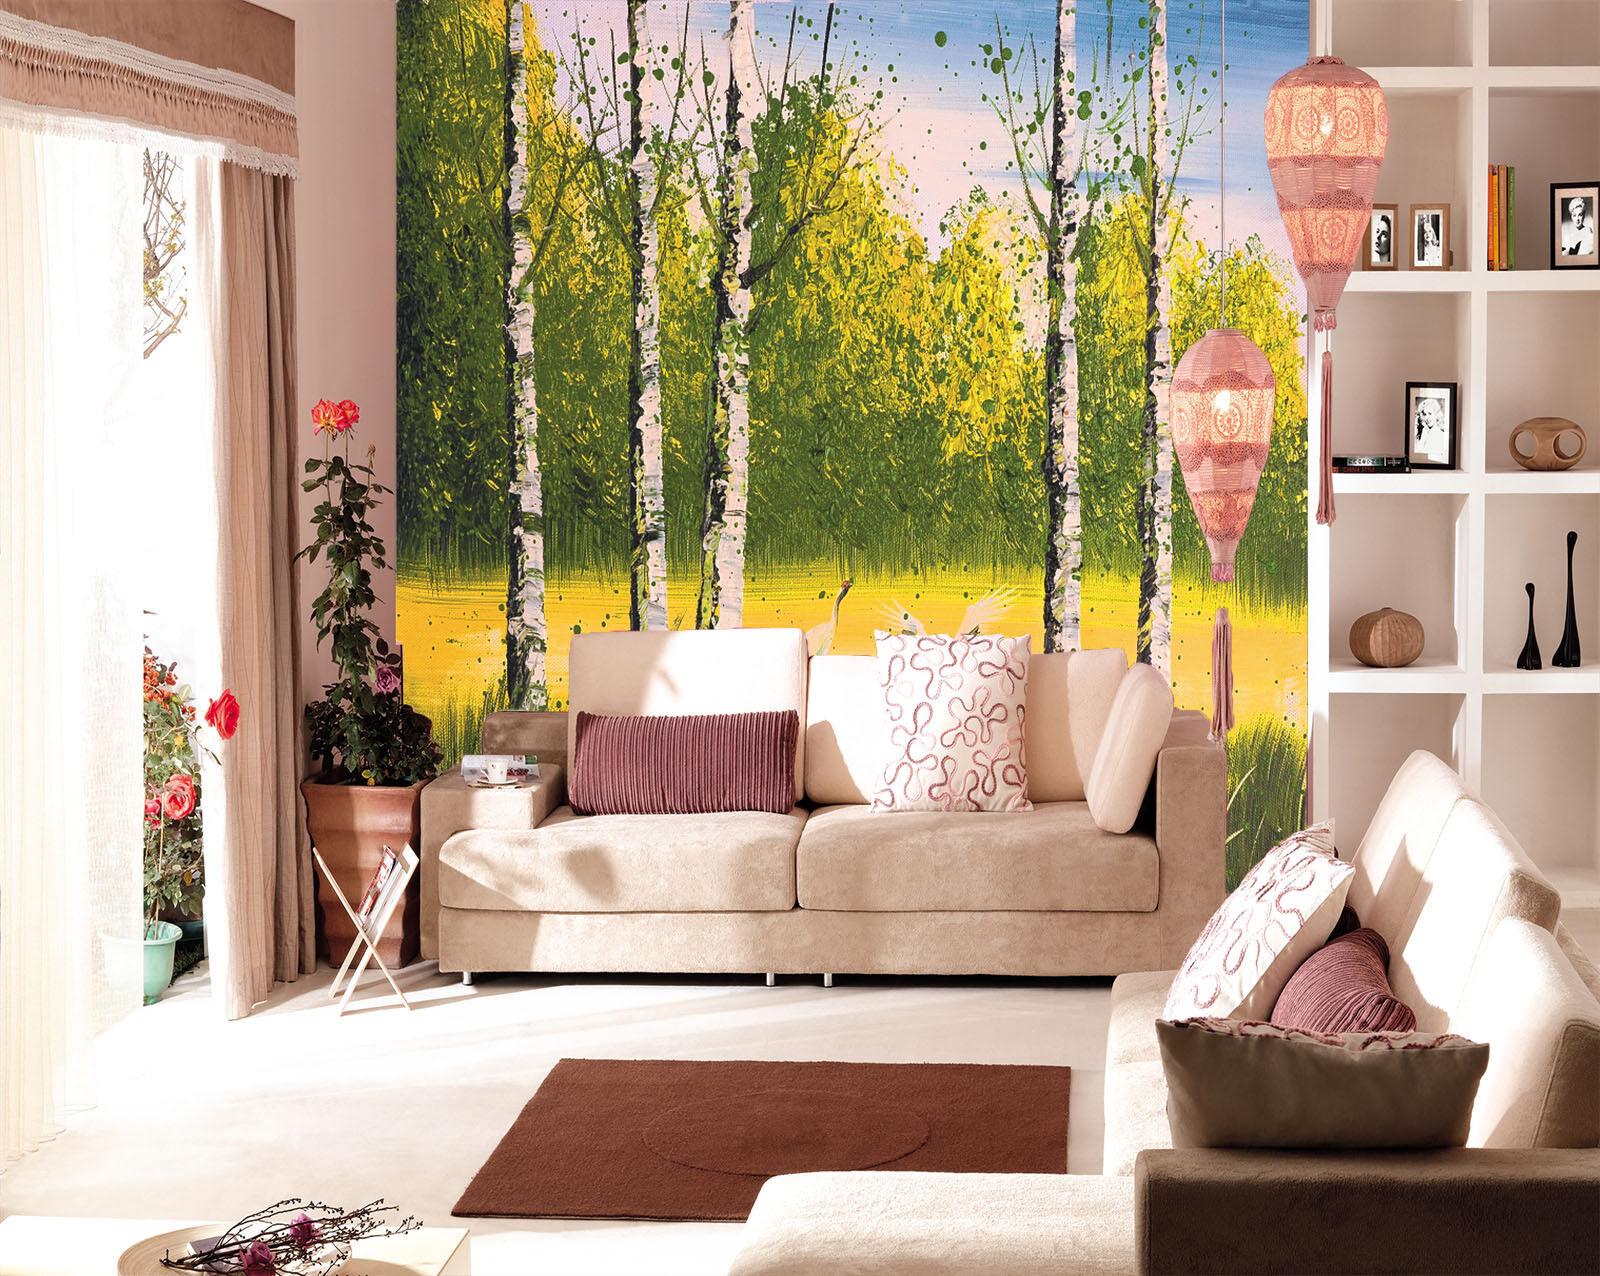 3D Grün Tree Lawn 710 Wallpaper Mural Wall Print Wall Wallpaper Murals US Lemon